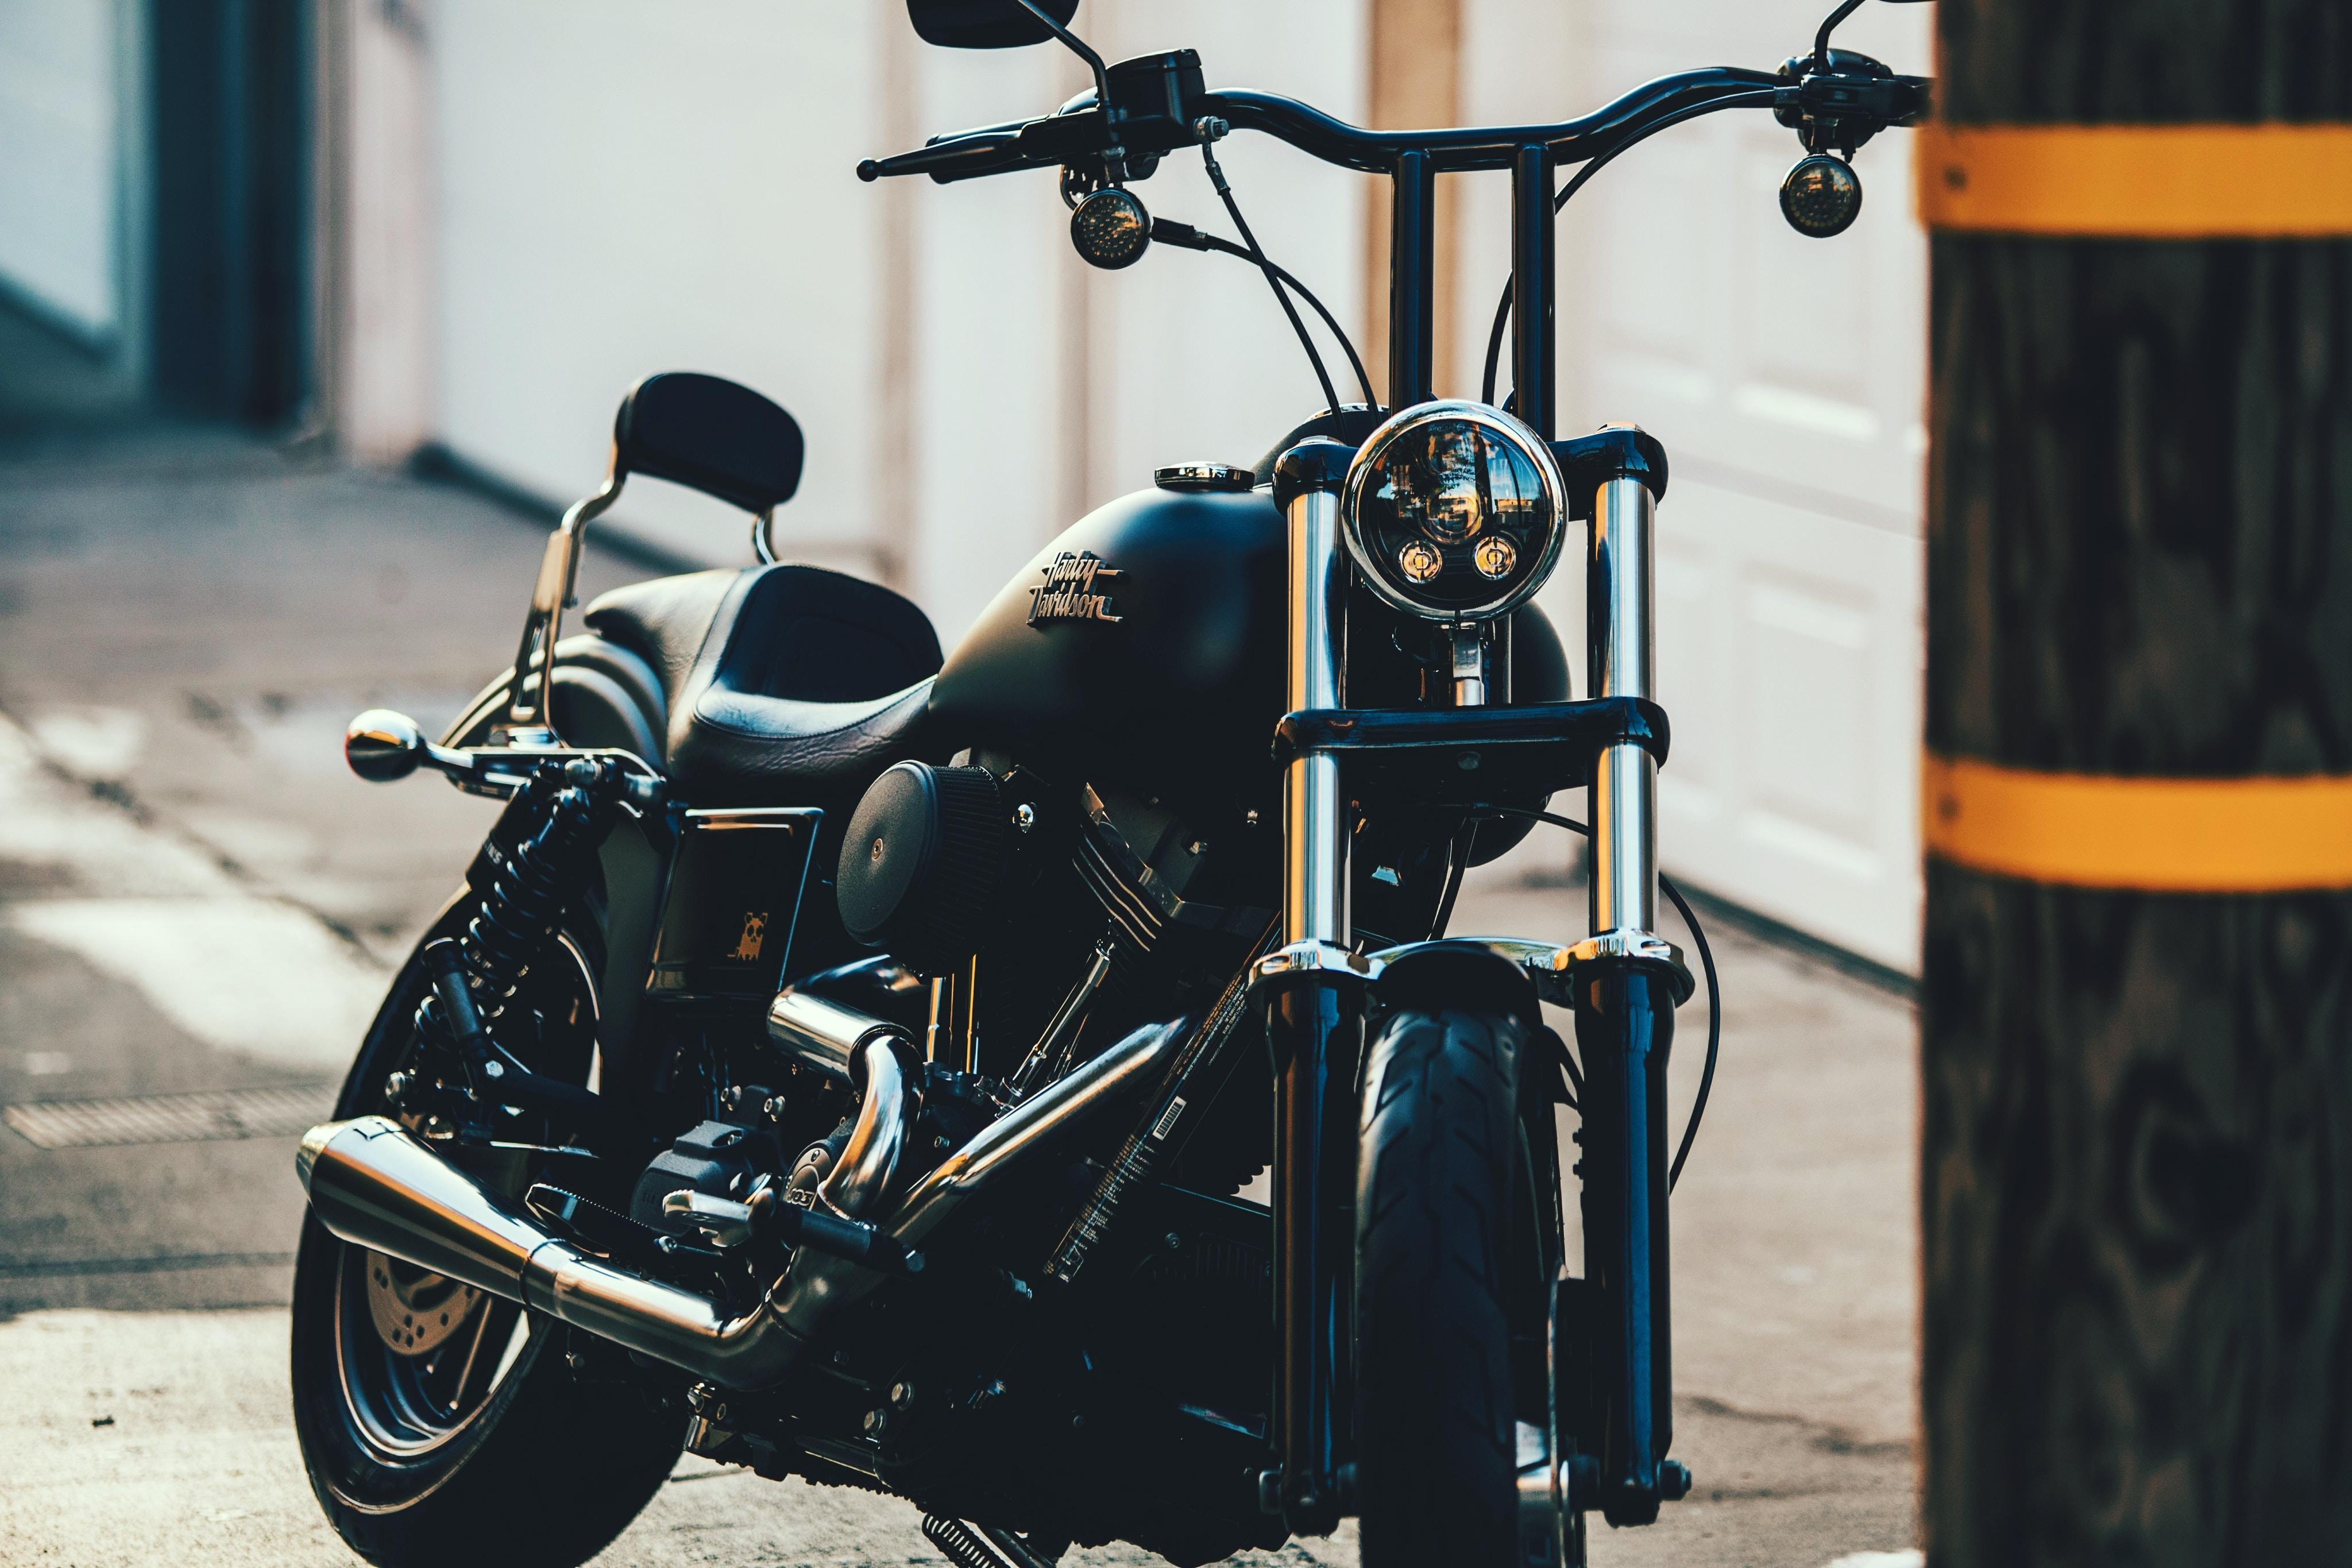 black cruiser motorcycle near black street post